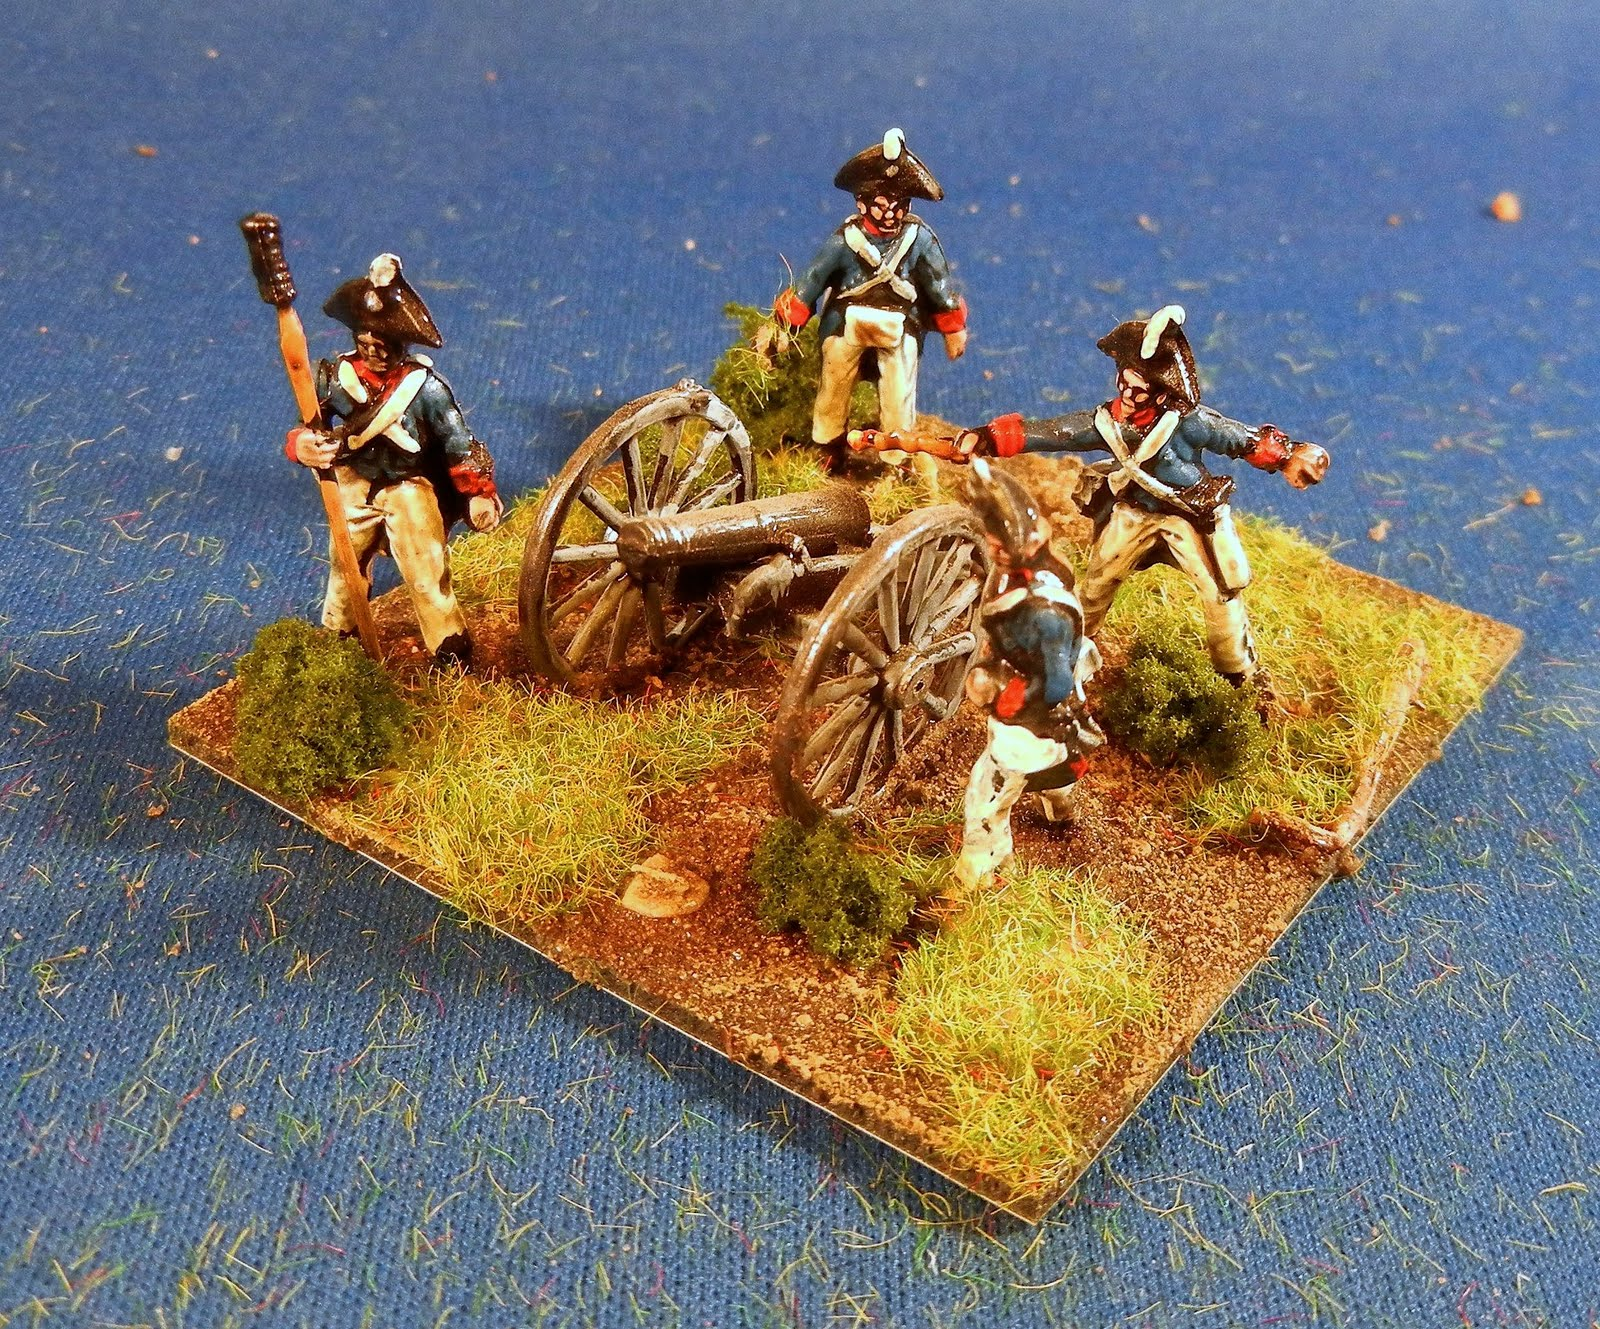 Bob S Miniature Wargaming Blog War Of American Artillery